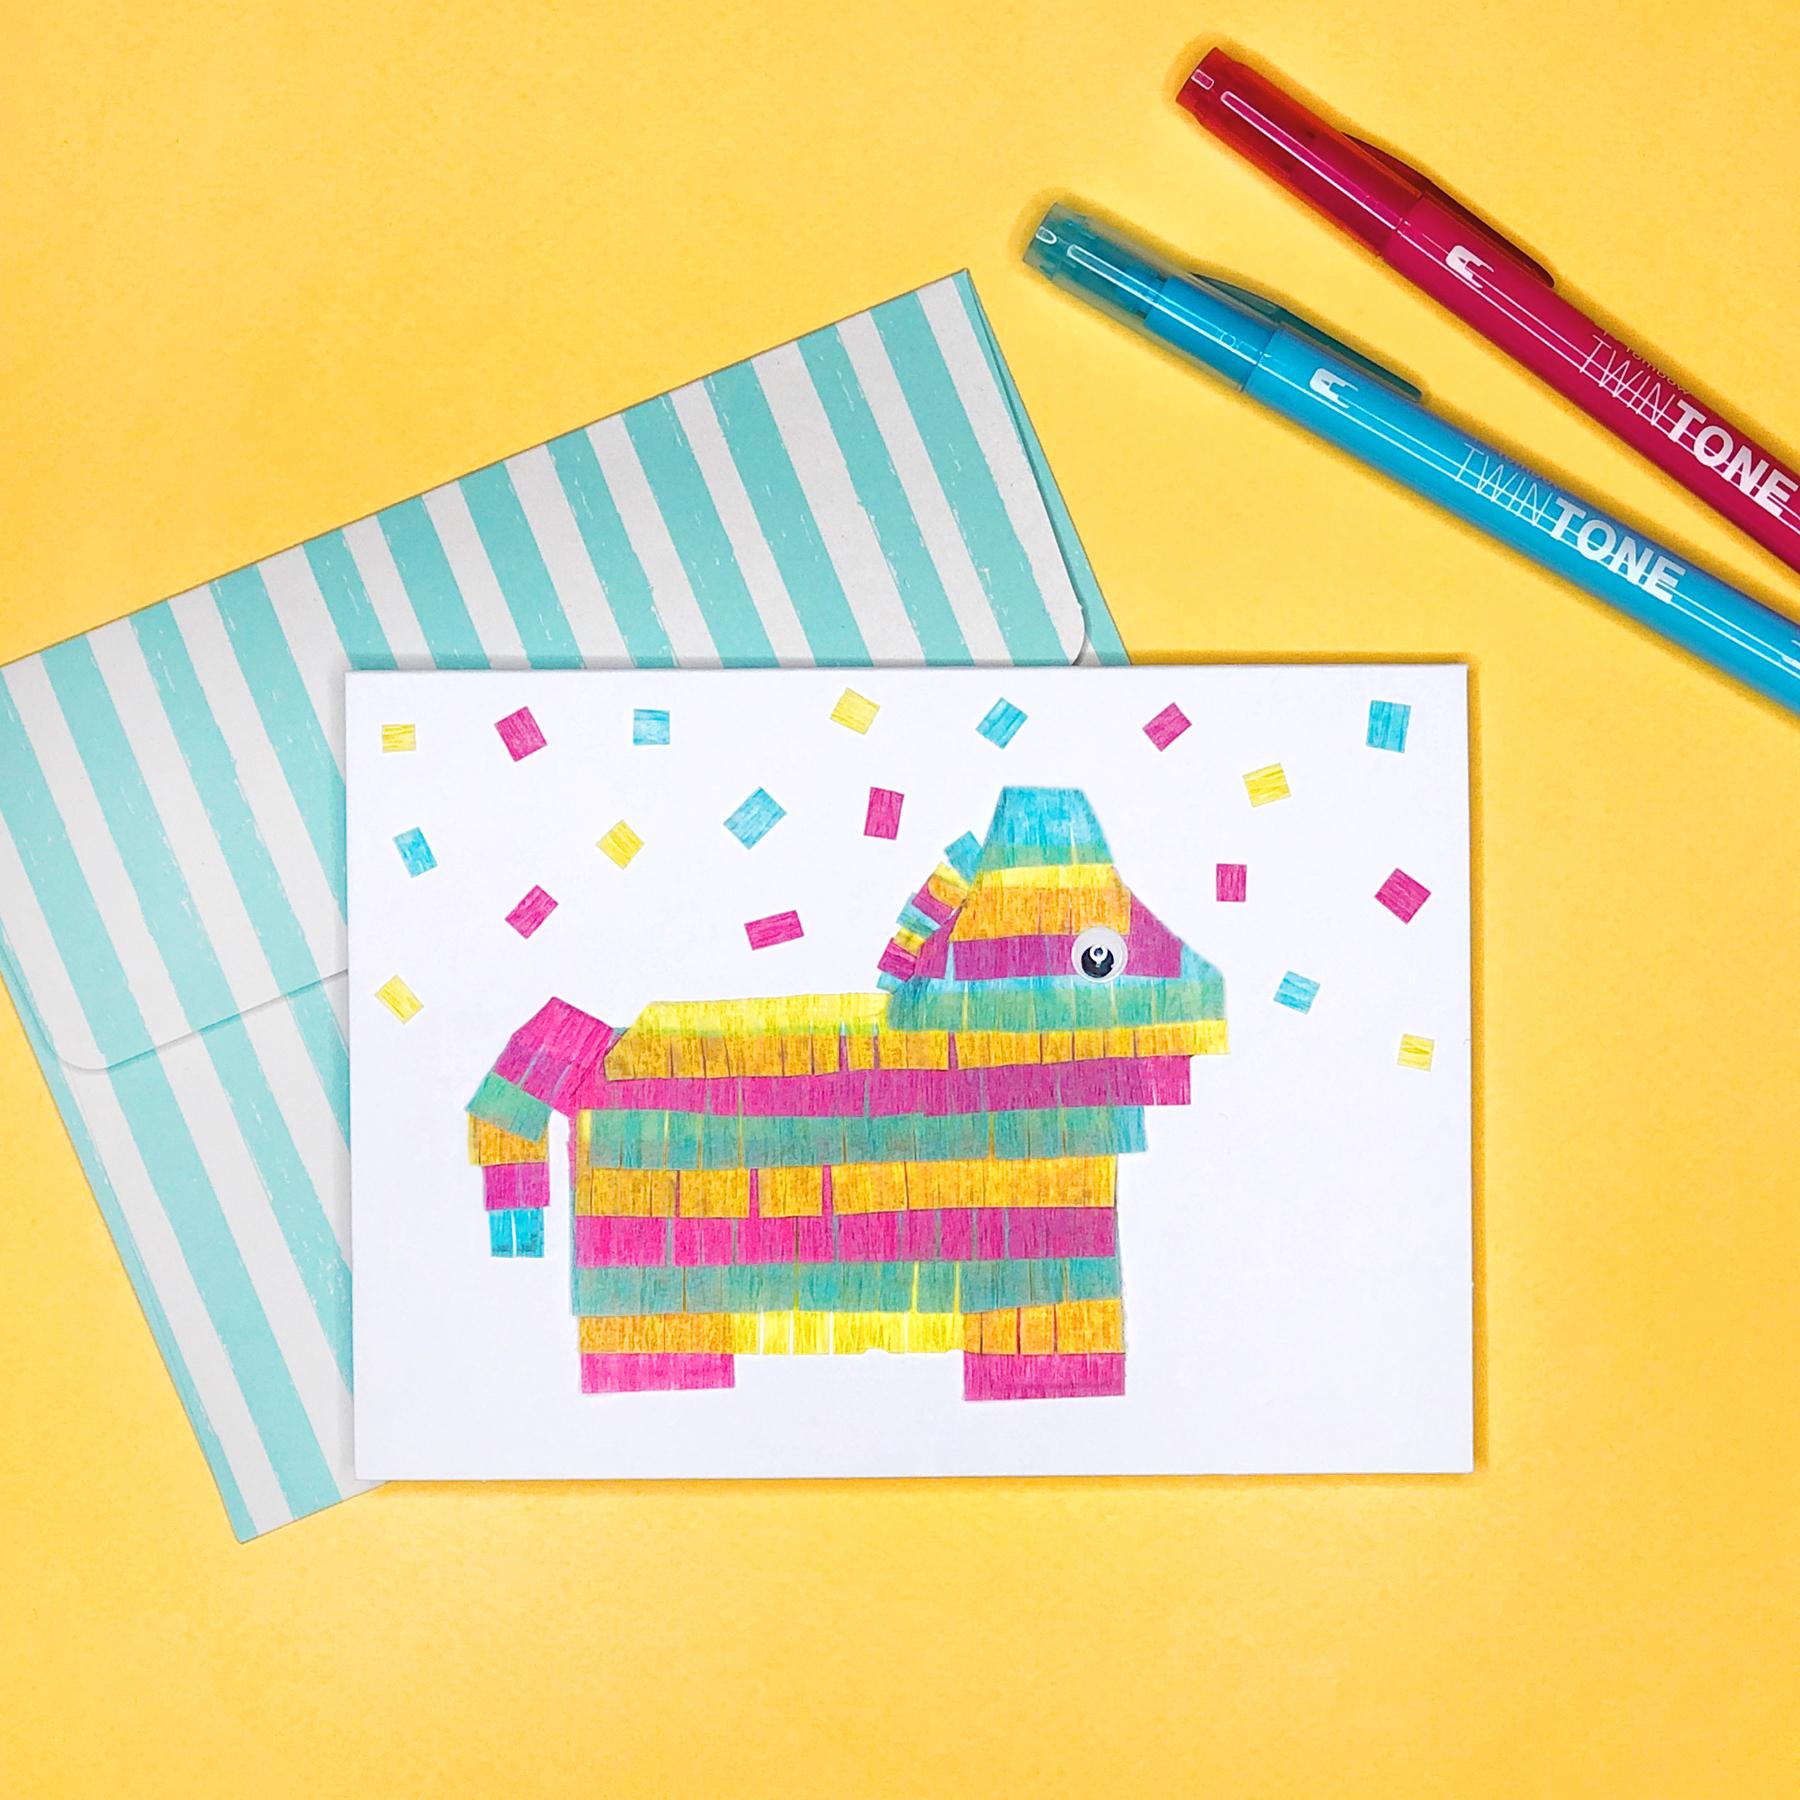 How to Make a Pinata Card by Jessica Mack of BrownPaperBunny